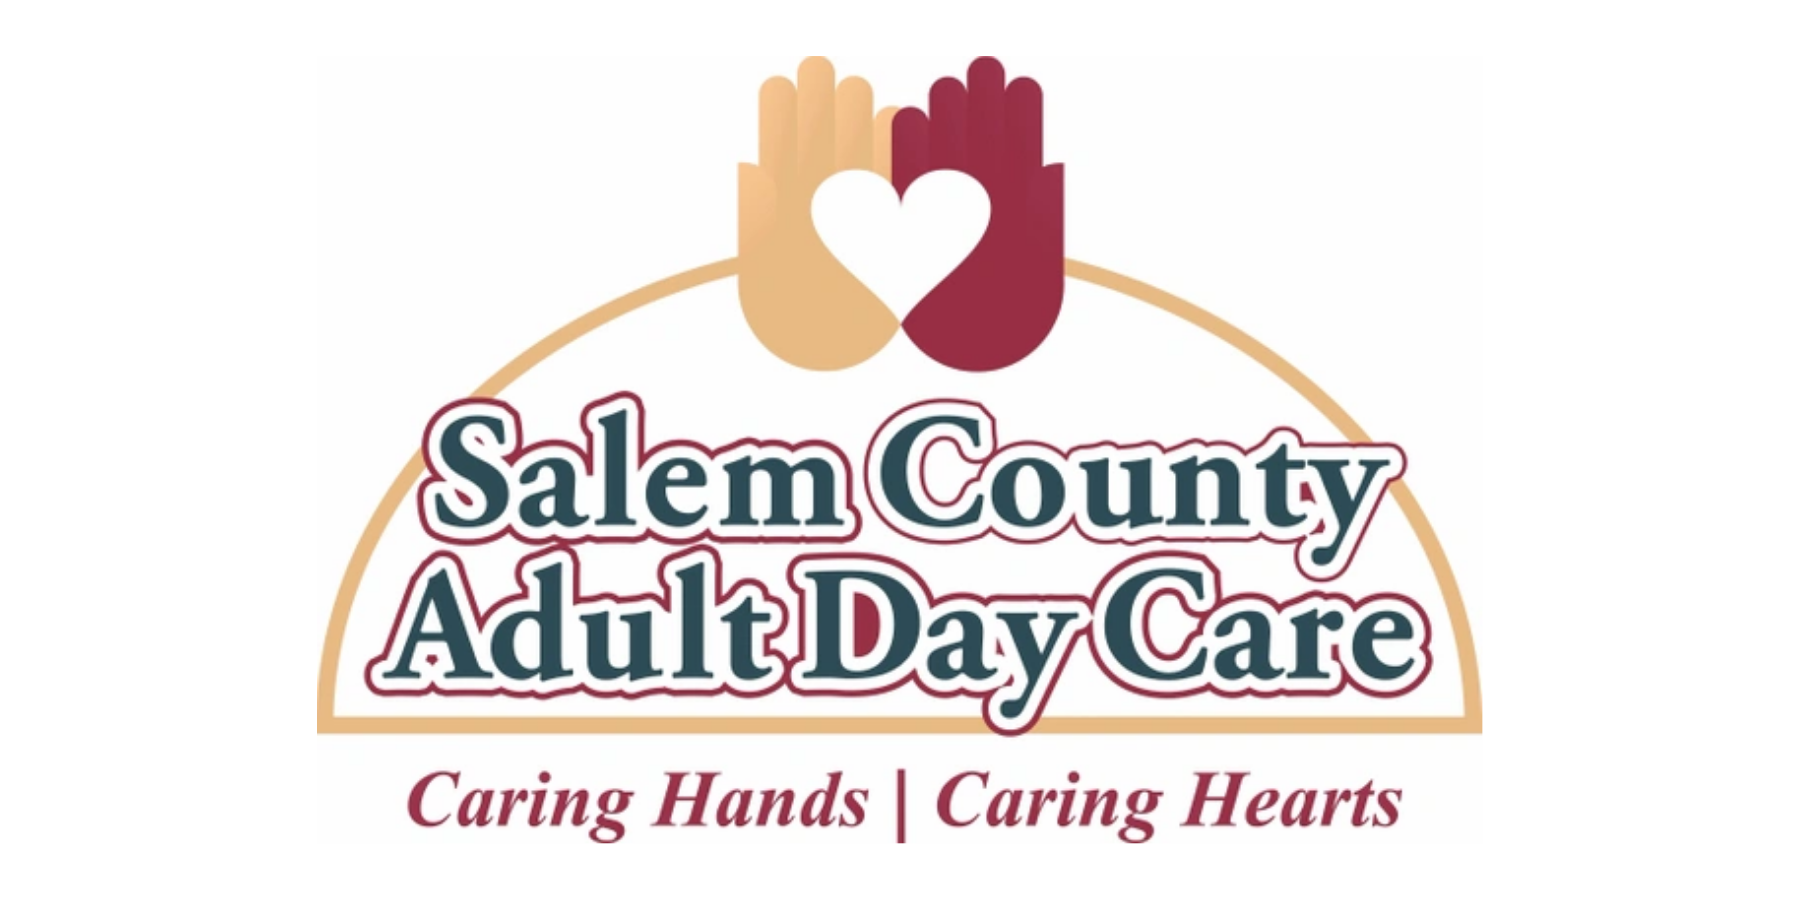 Salem County Adult Day Care